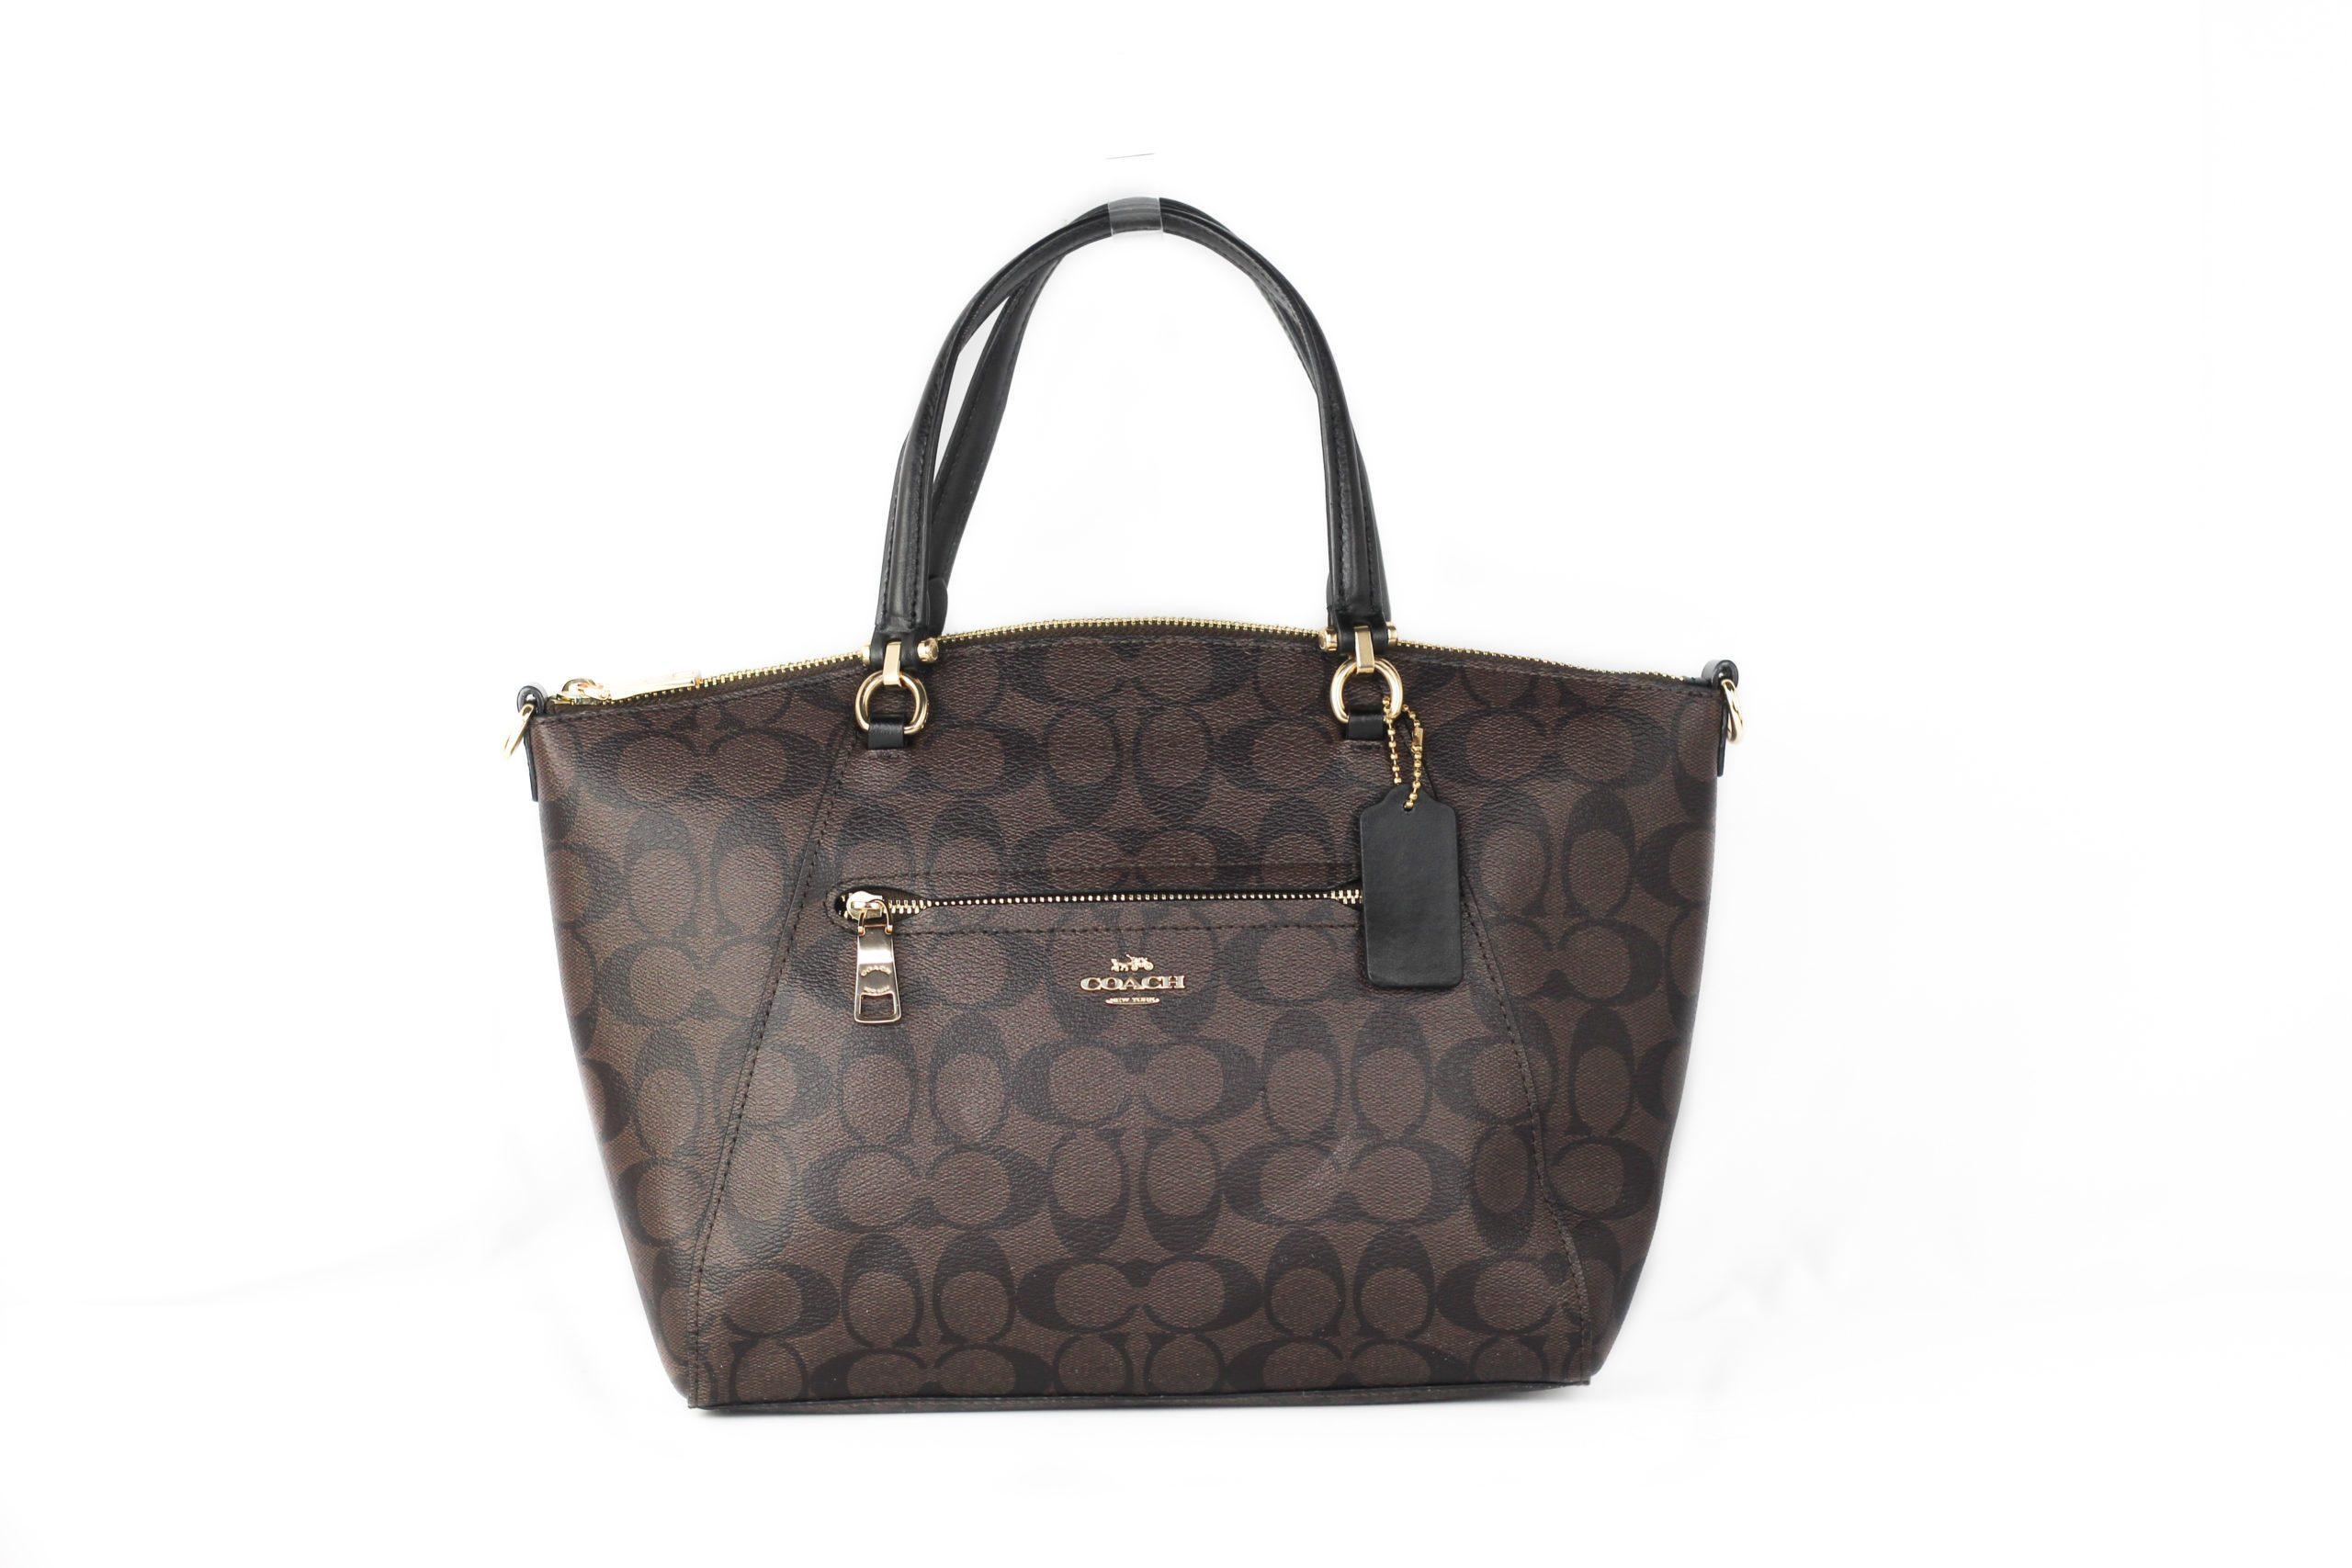 COACH Women's Katy Dome Satchel Bag Black 87302